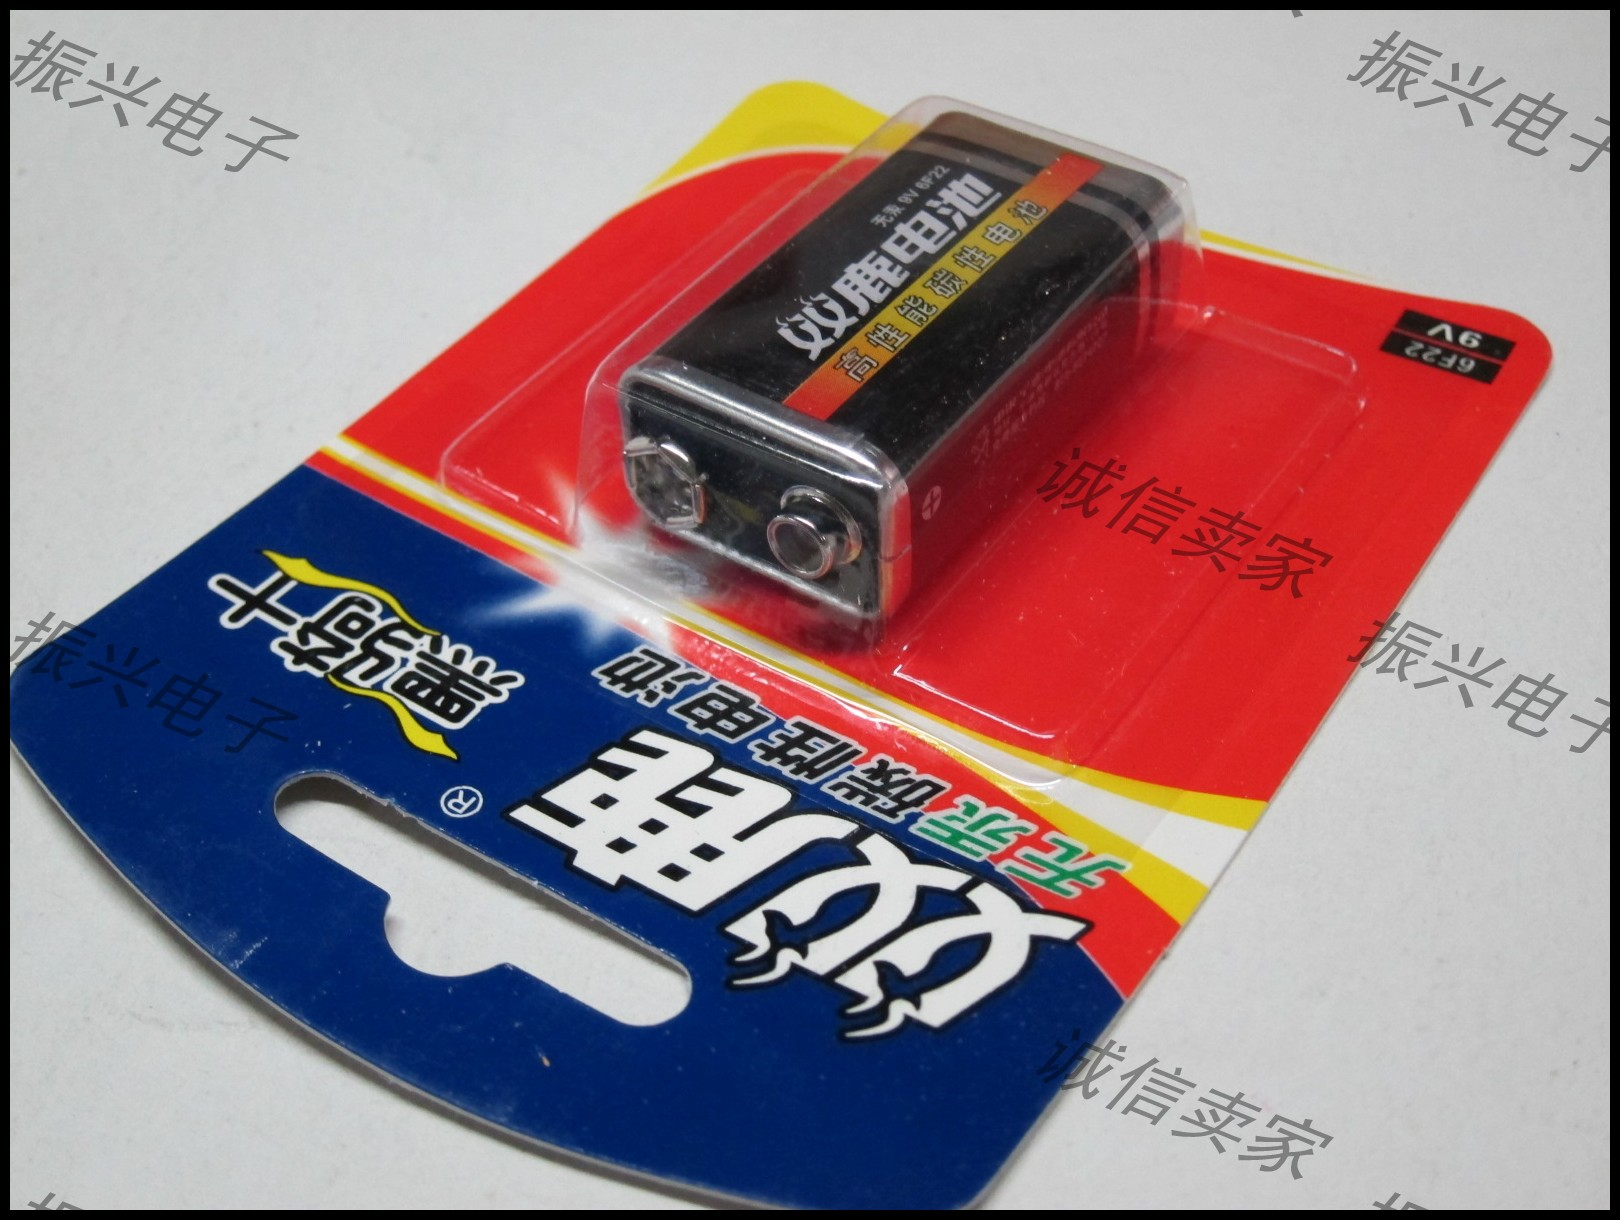 ( трясти интерес электронный )9V аккумулятор 6F22 олень аккумулятор углерод секс аккумулятор черный рыцарь 1 зерна карта